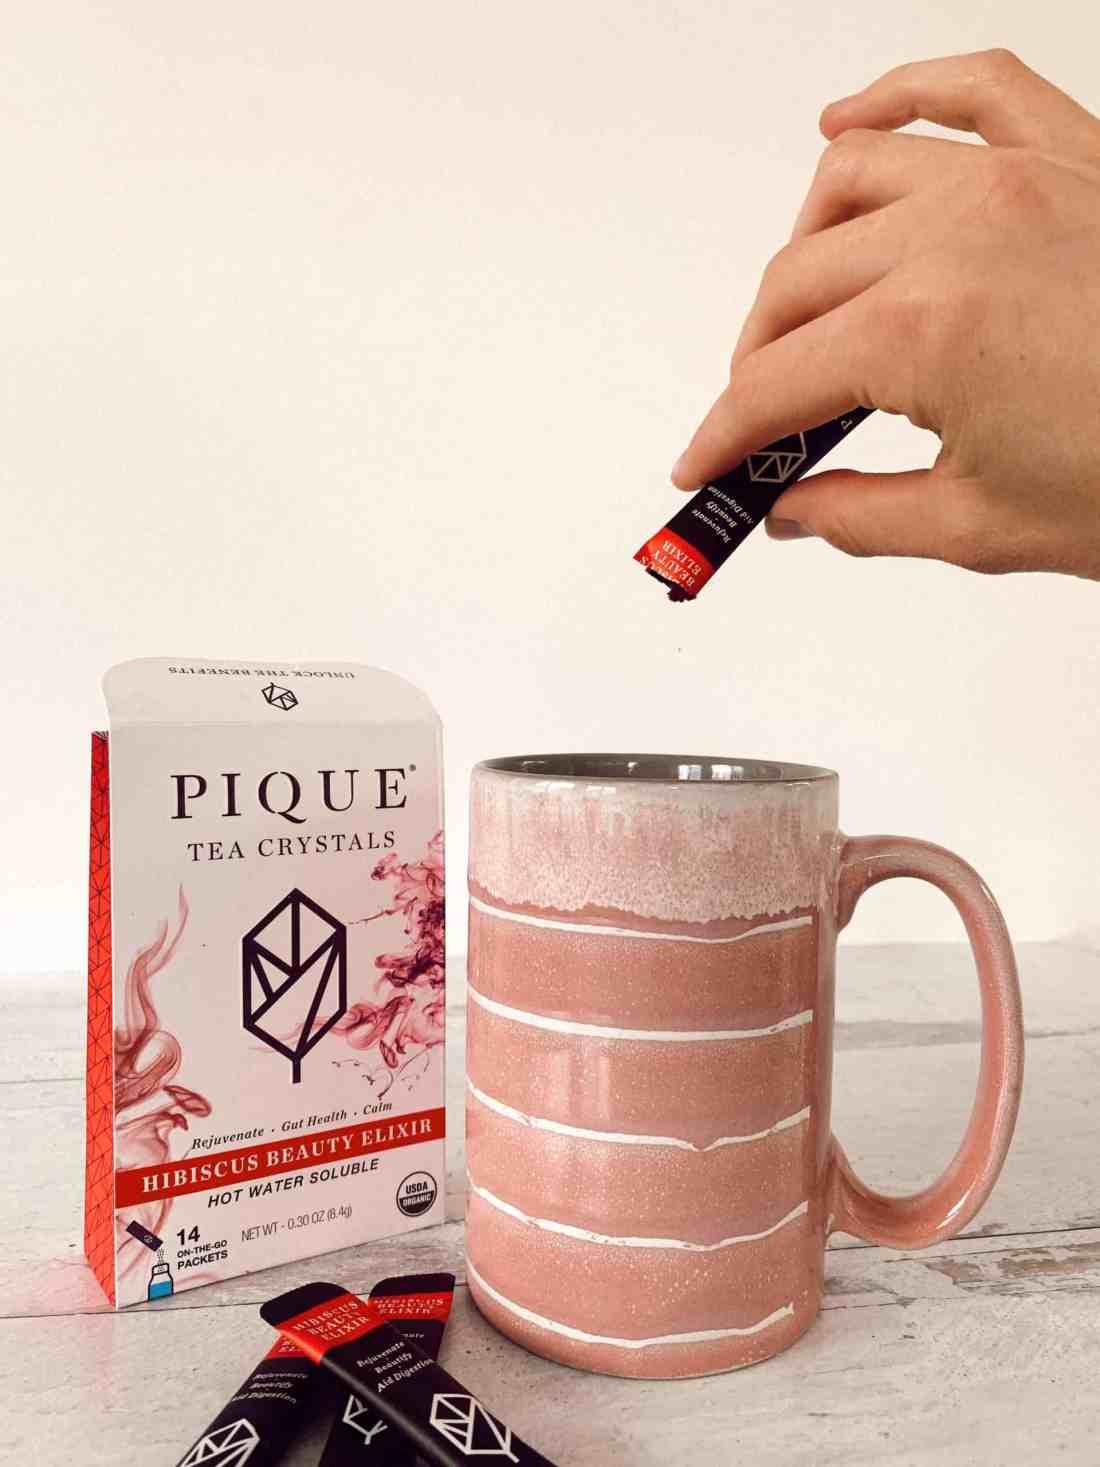 My Pique Tea box sitting next to my pink tea mug.